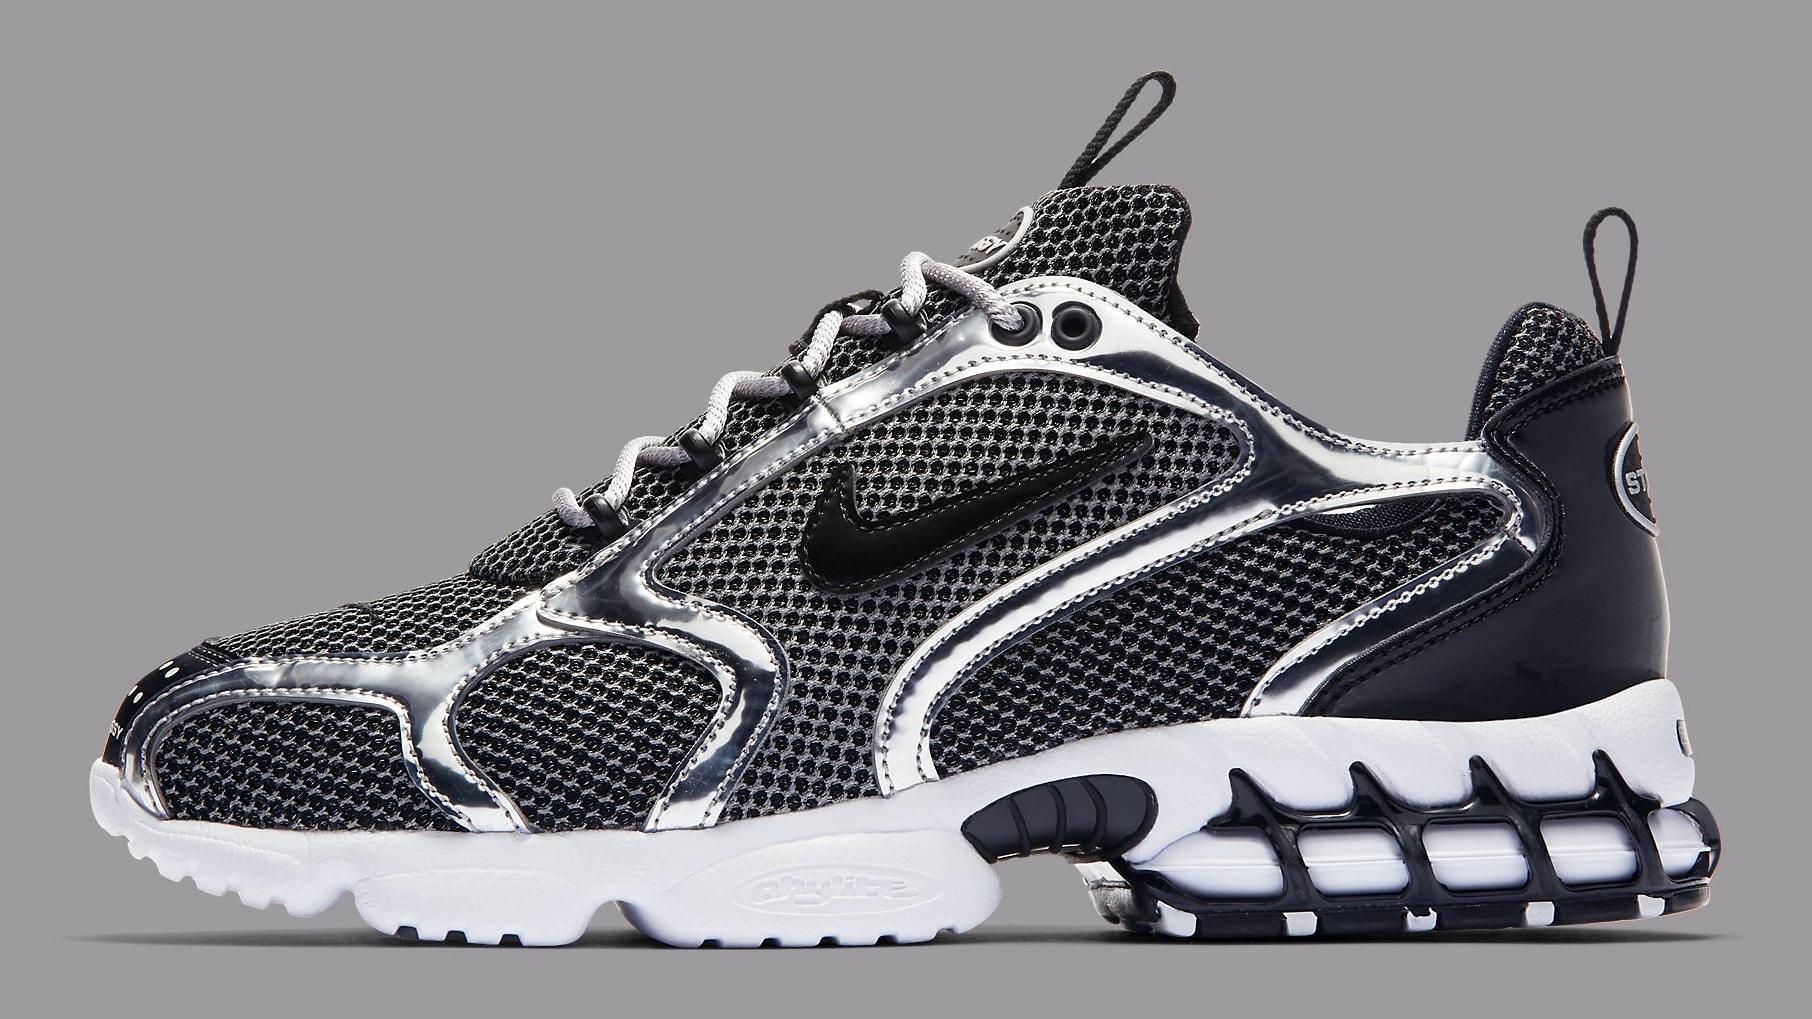 Stussy x Nike Air Zoom Spiridon CG 2 Release Date Confirmed: Photos